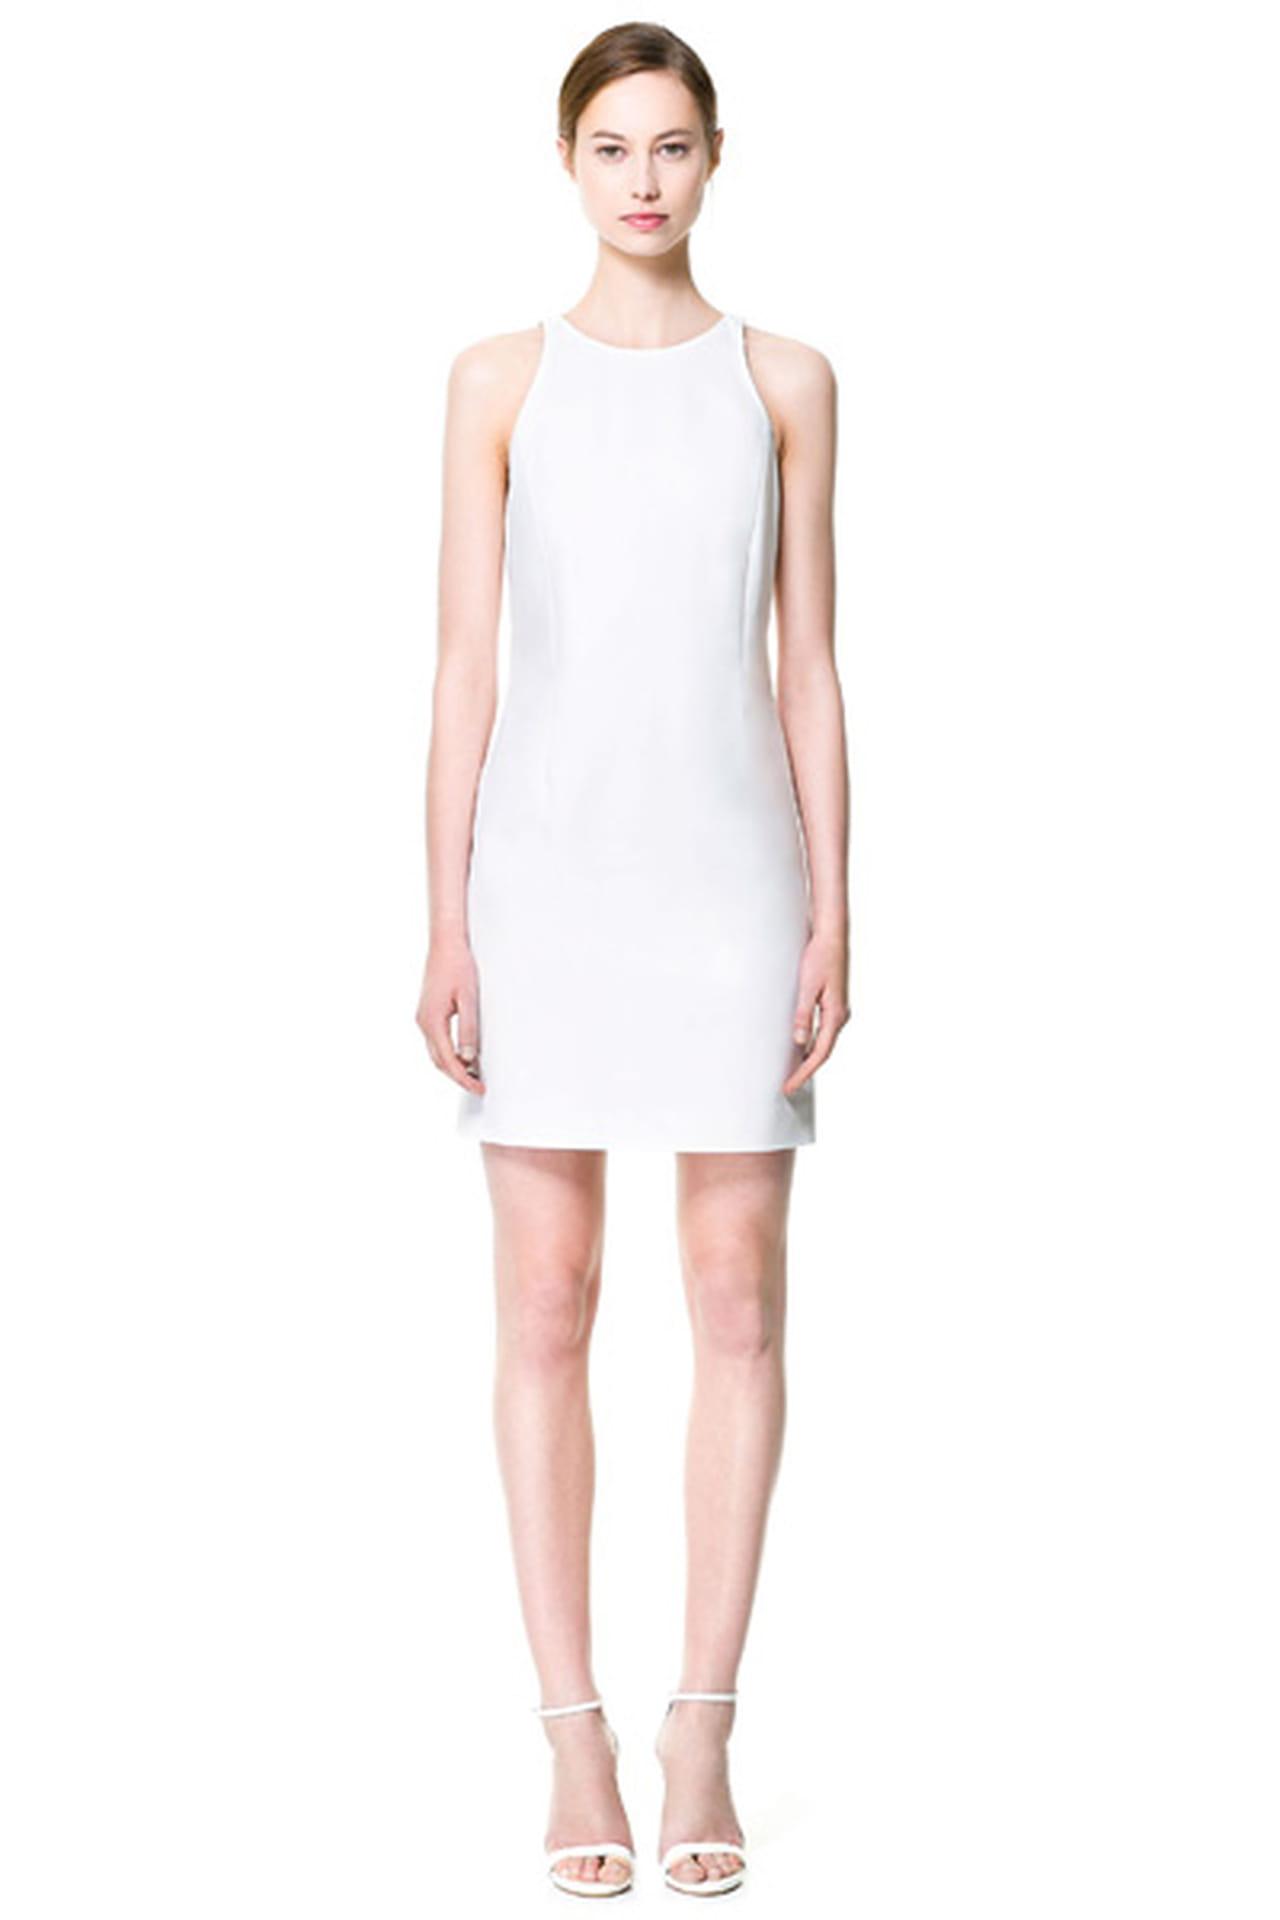 50bb924dff6bb فستان كلاسيكي من Zara. فستان أبيض من Zara. من موضة صيف 2013